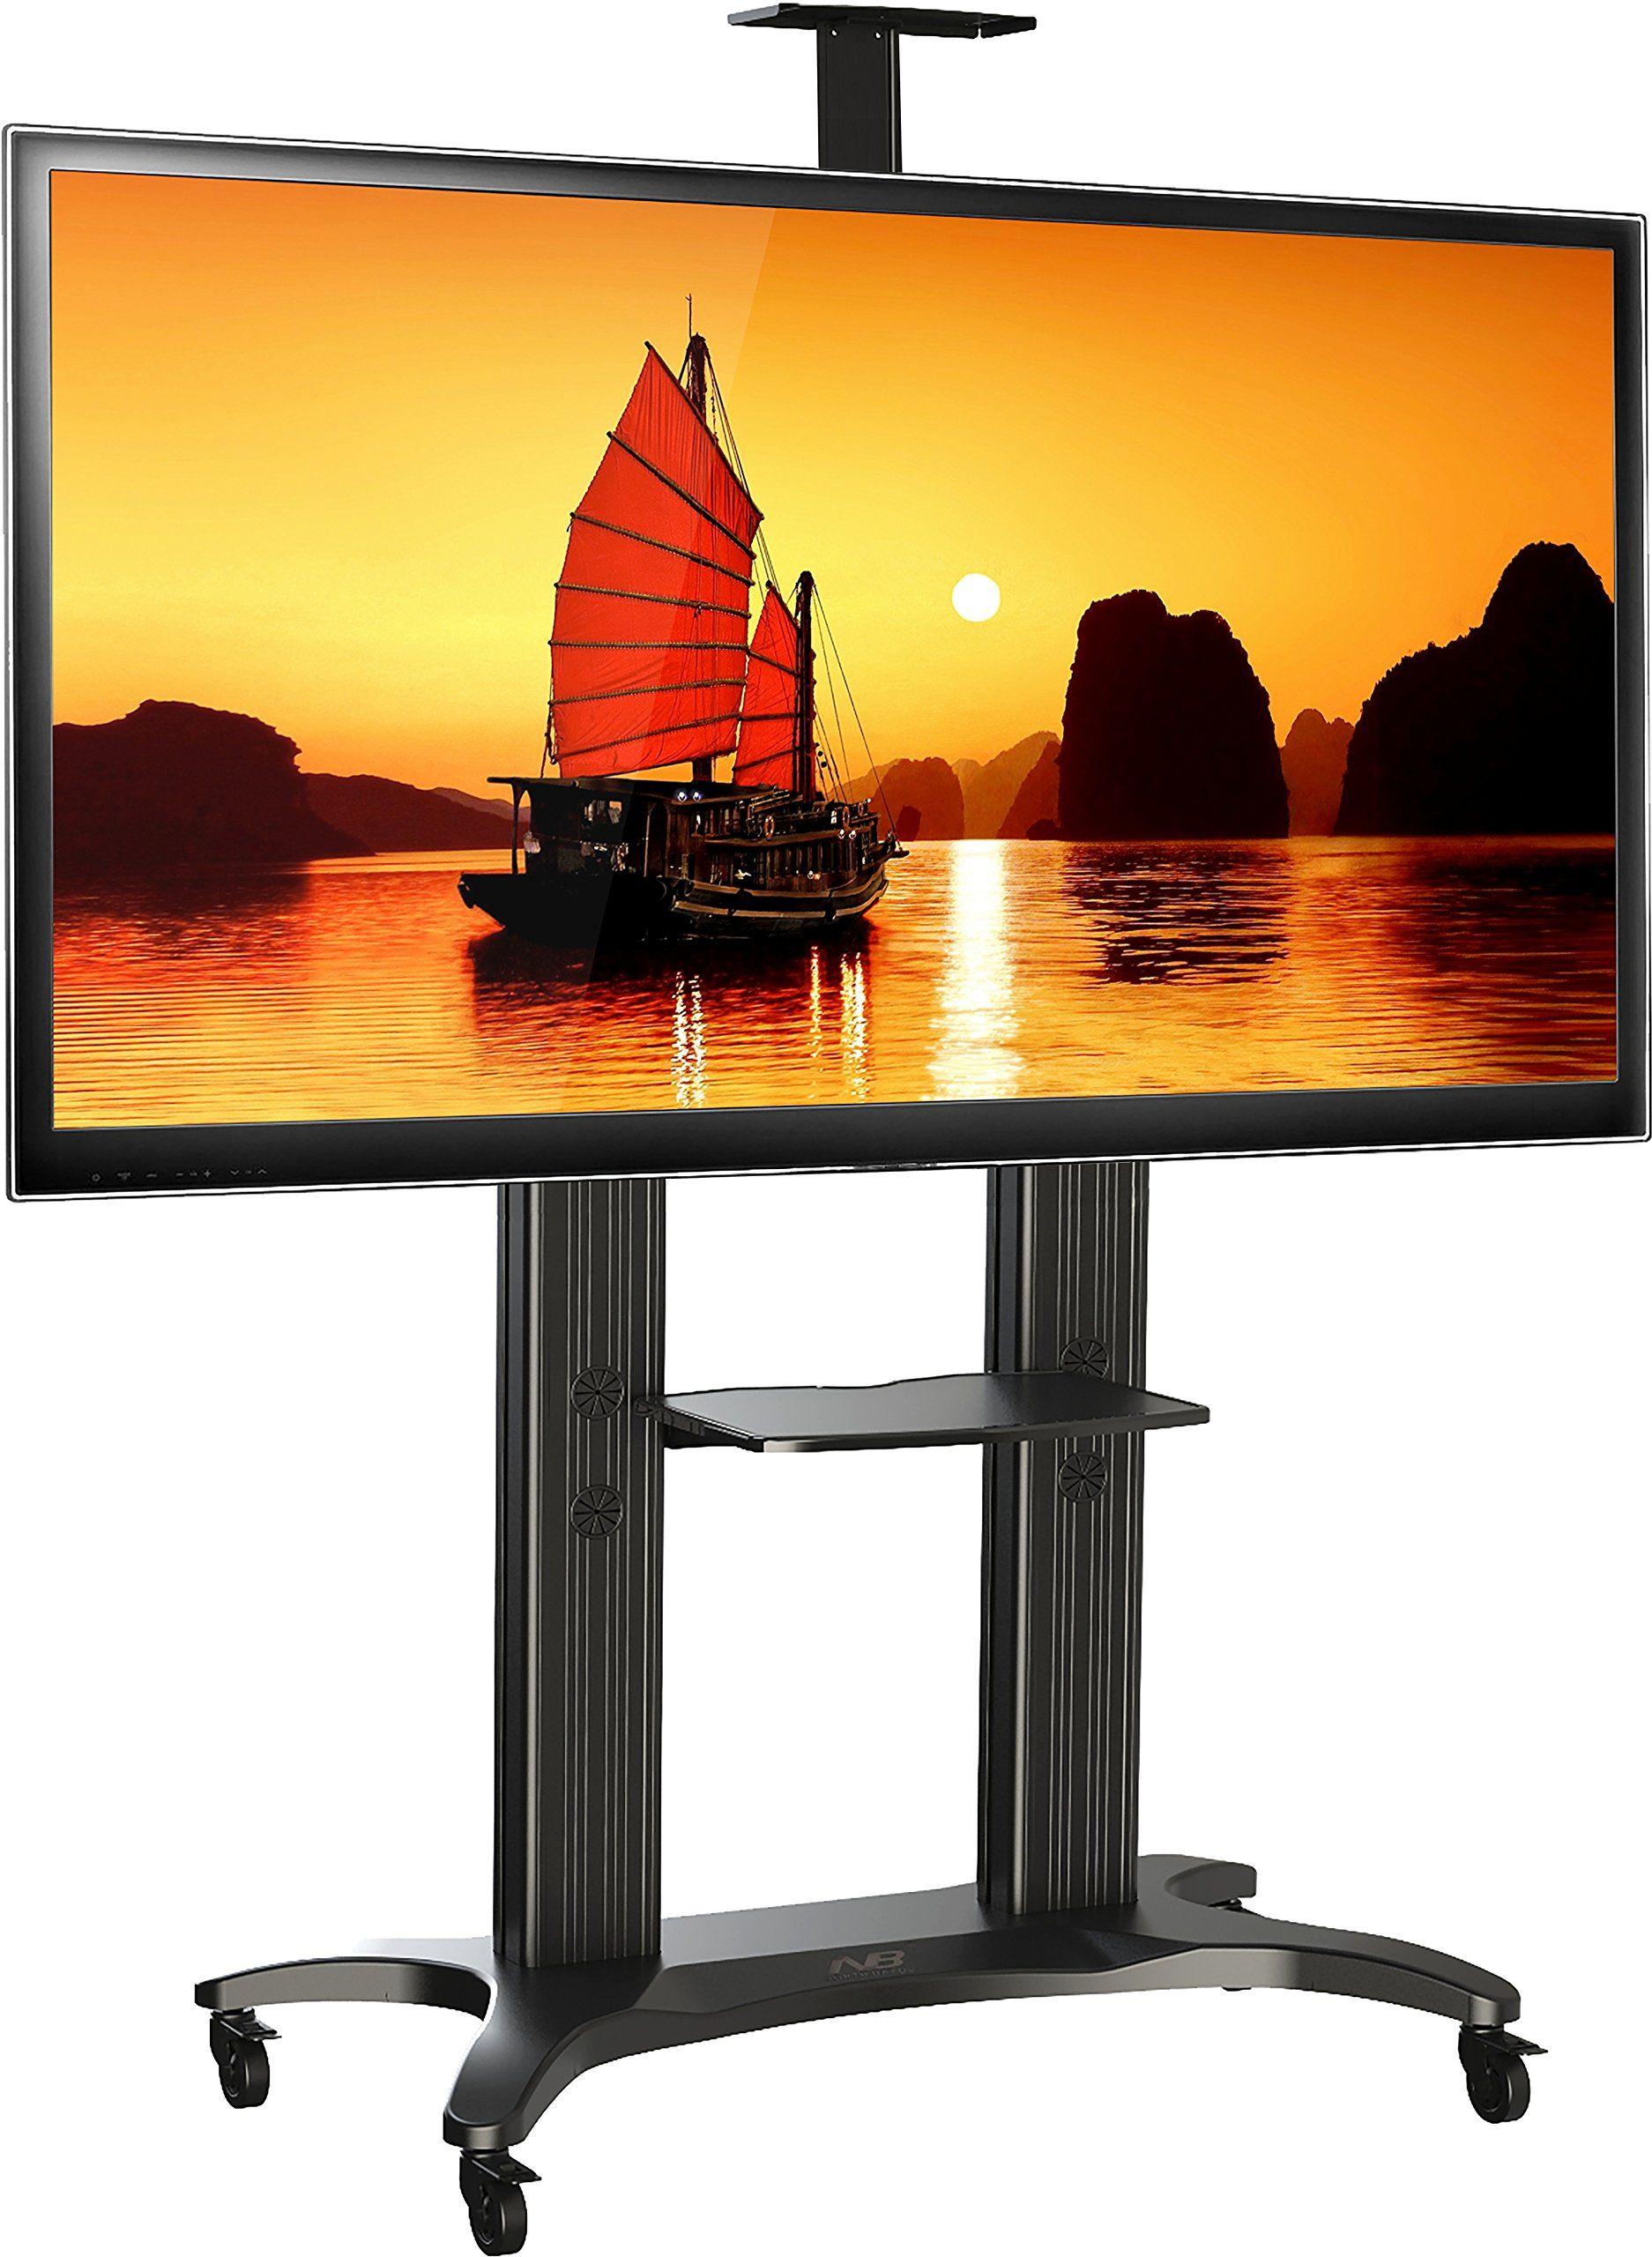 tvstands modern home tv stand pedestal milan catalog bh stands filters concept